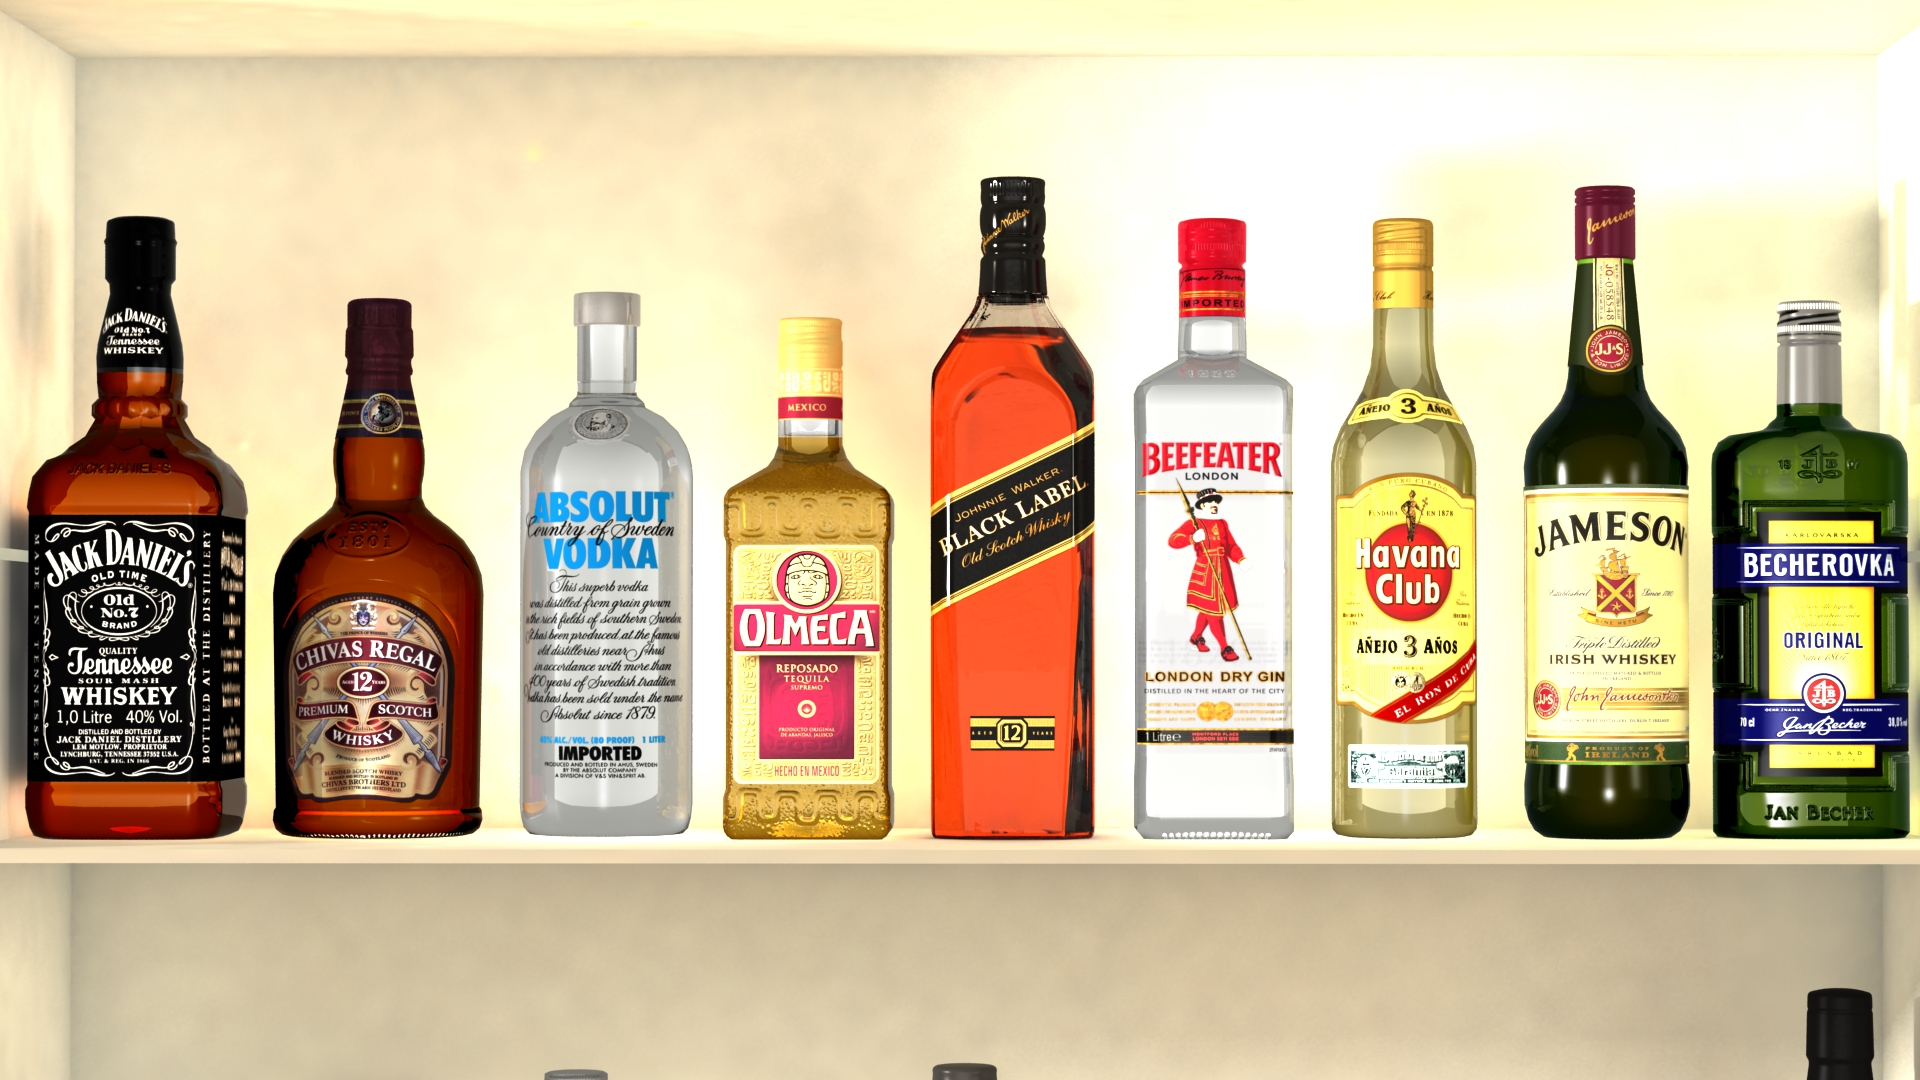 liquor bottles with bar unit interior vr/ar ready 3d model 3ds max  fbx jpeg jpg texture obj 279240